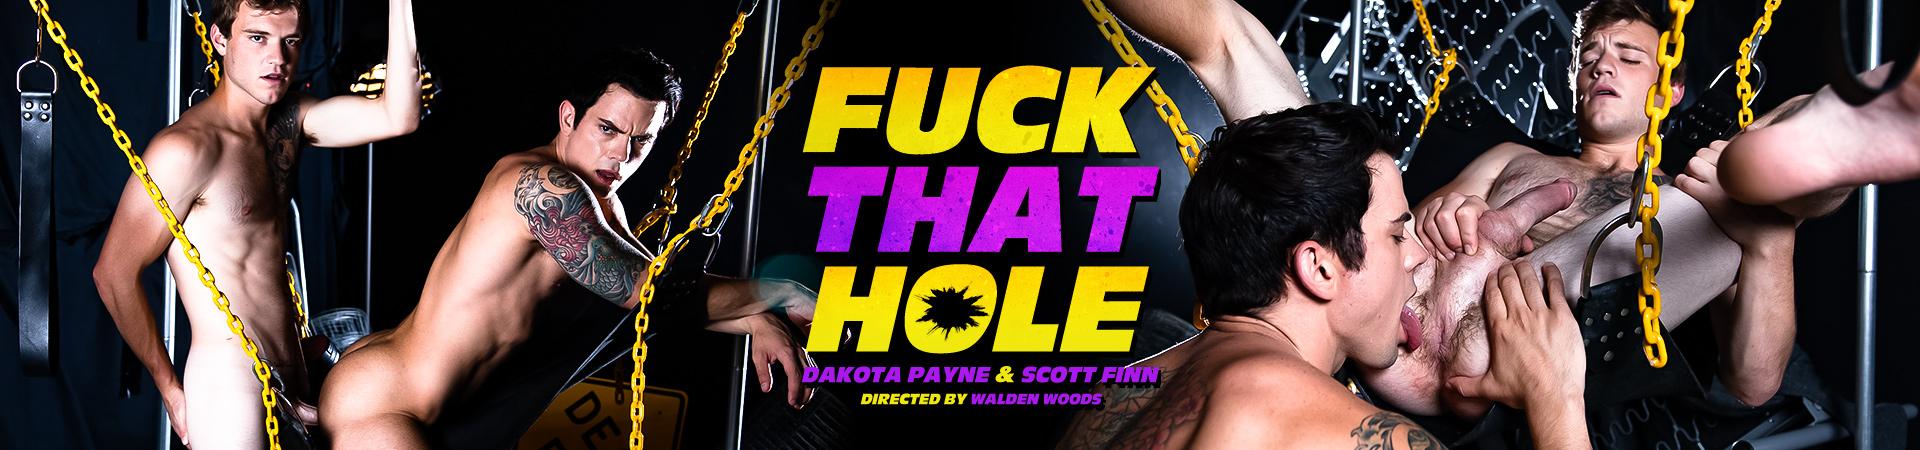 Fuck That Hole Featuring Dakota Payne and Scott Finn